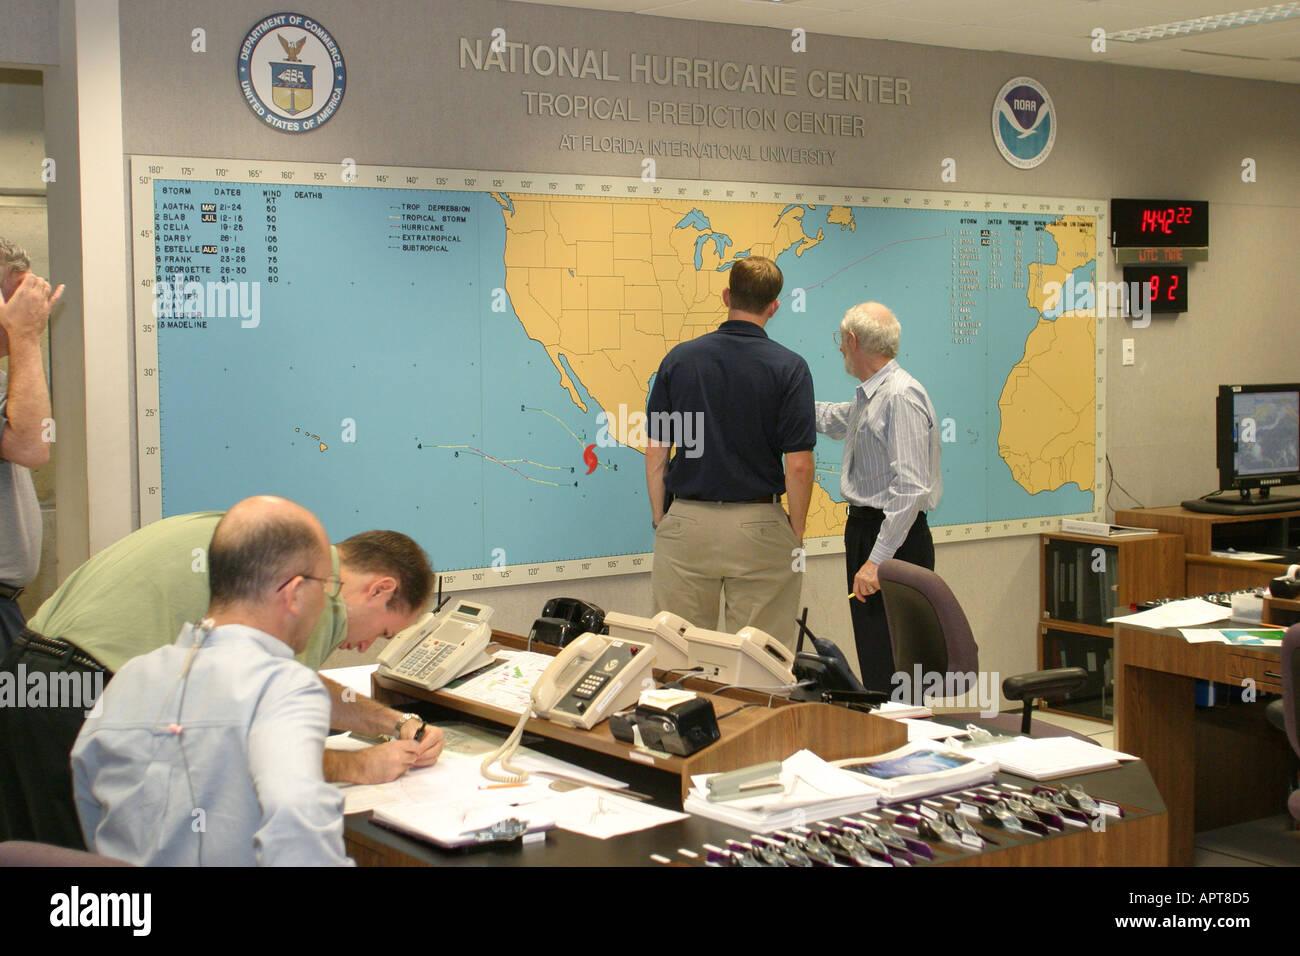 International hurricane center